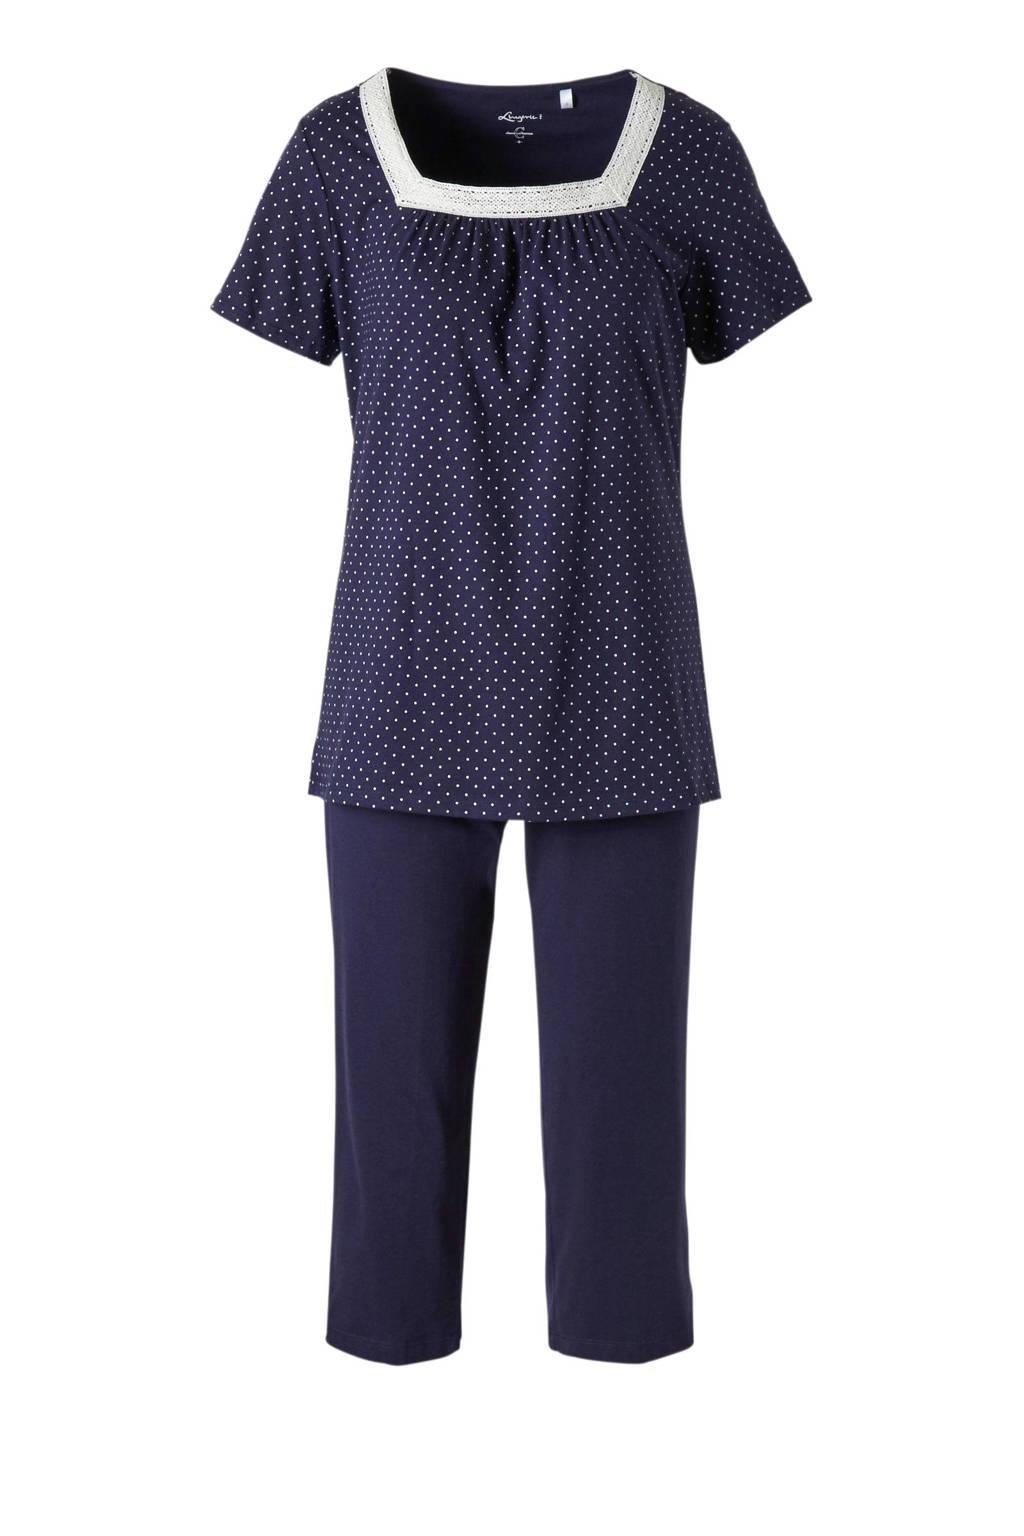 C&A Lingerie pyjama met stippen donkerblauw, Dot4ADkBlue